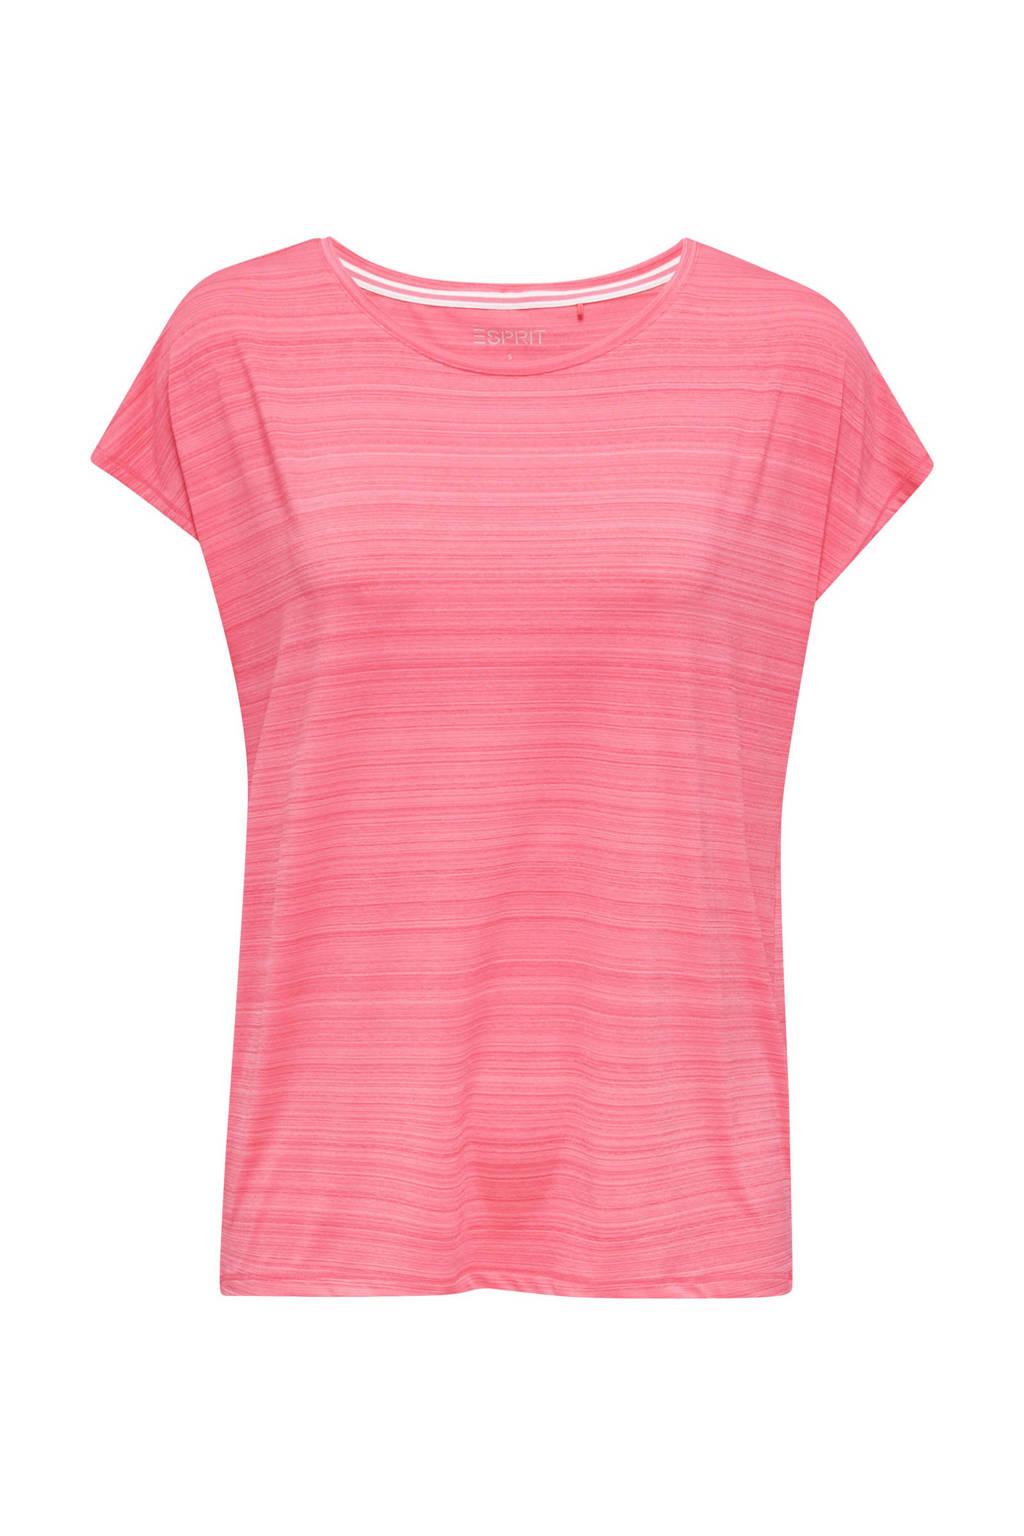 ESPRIT Women Sports T-shirt roze, Roze